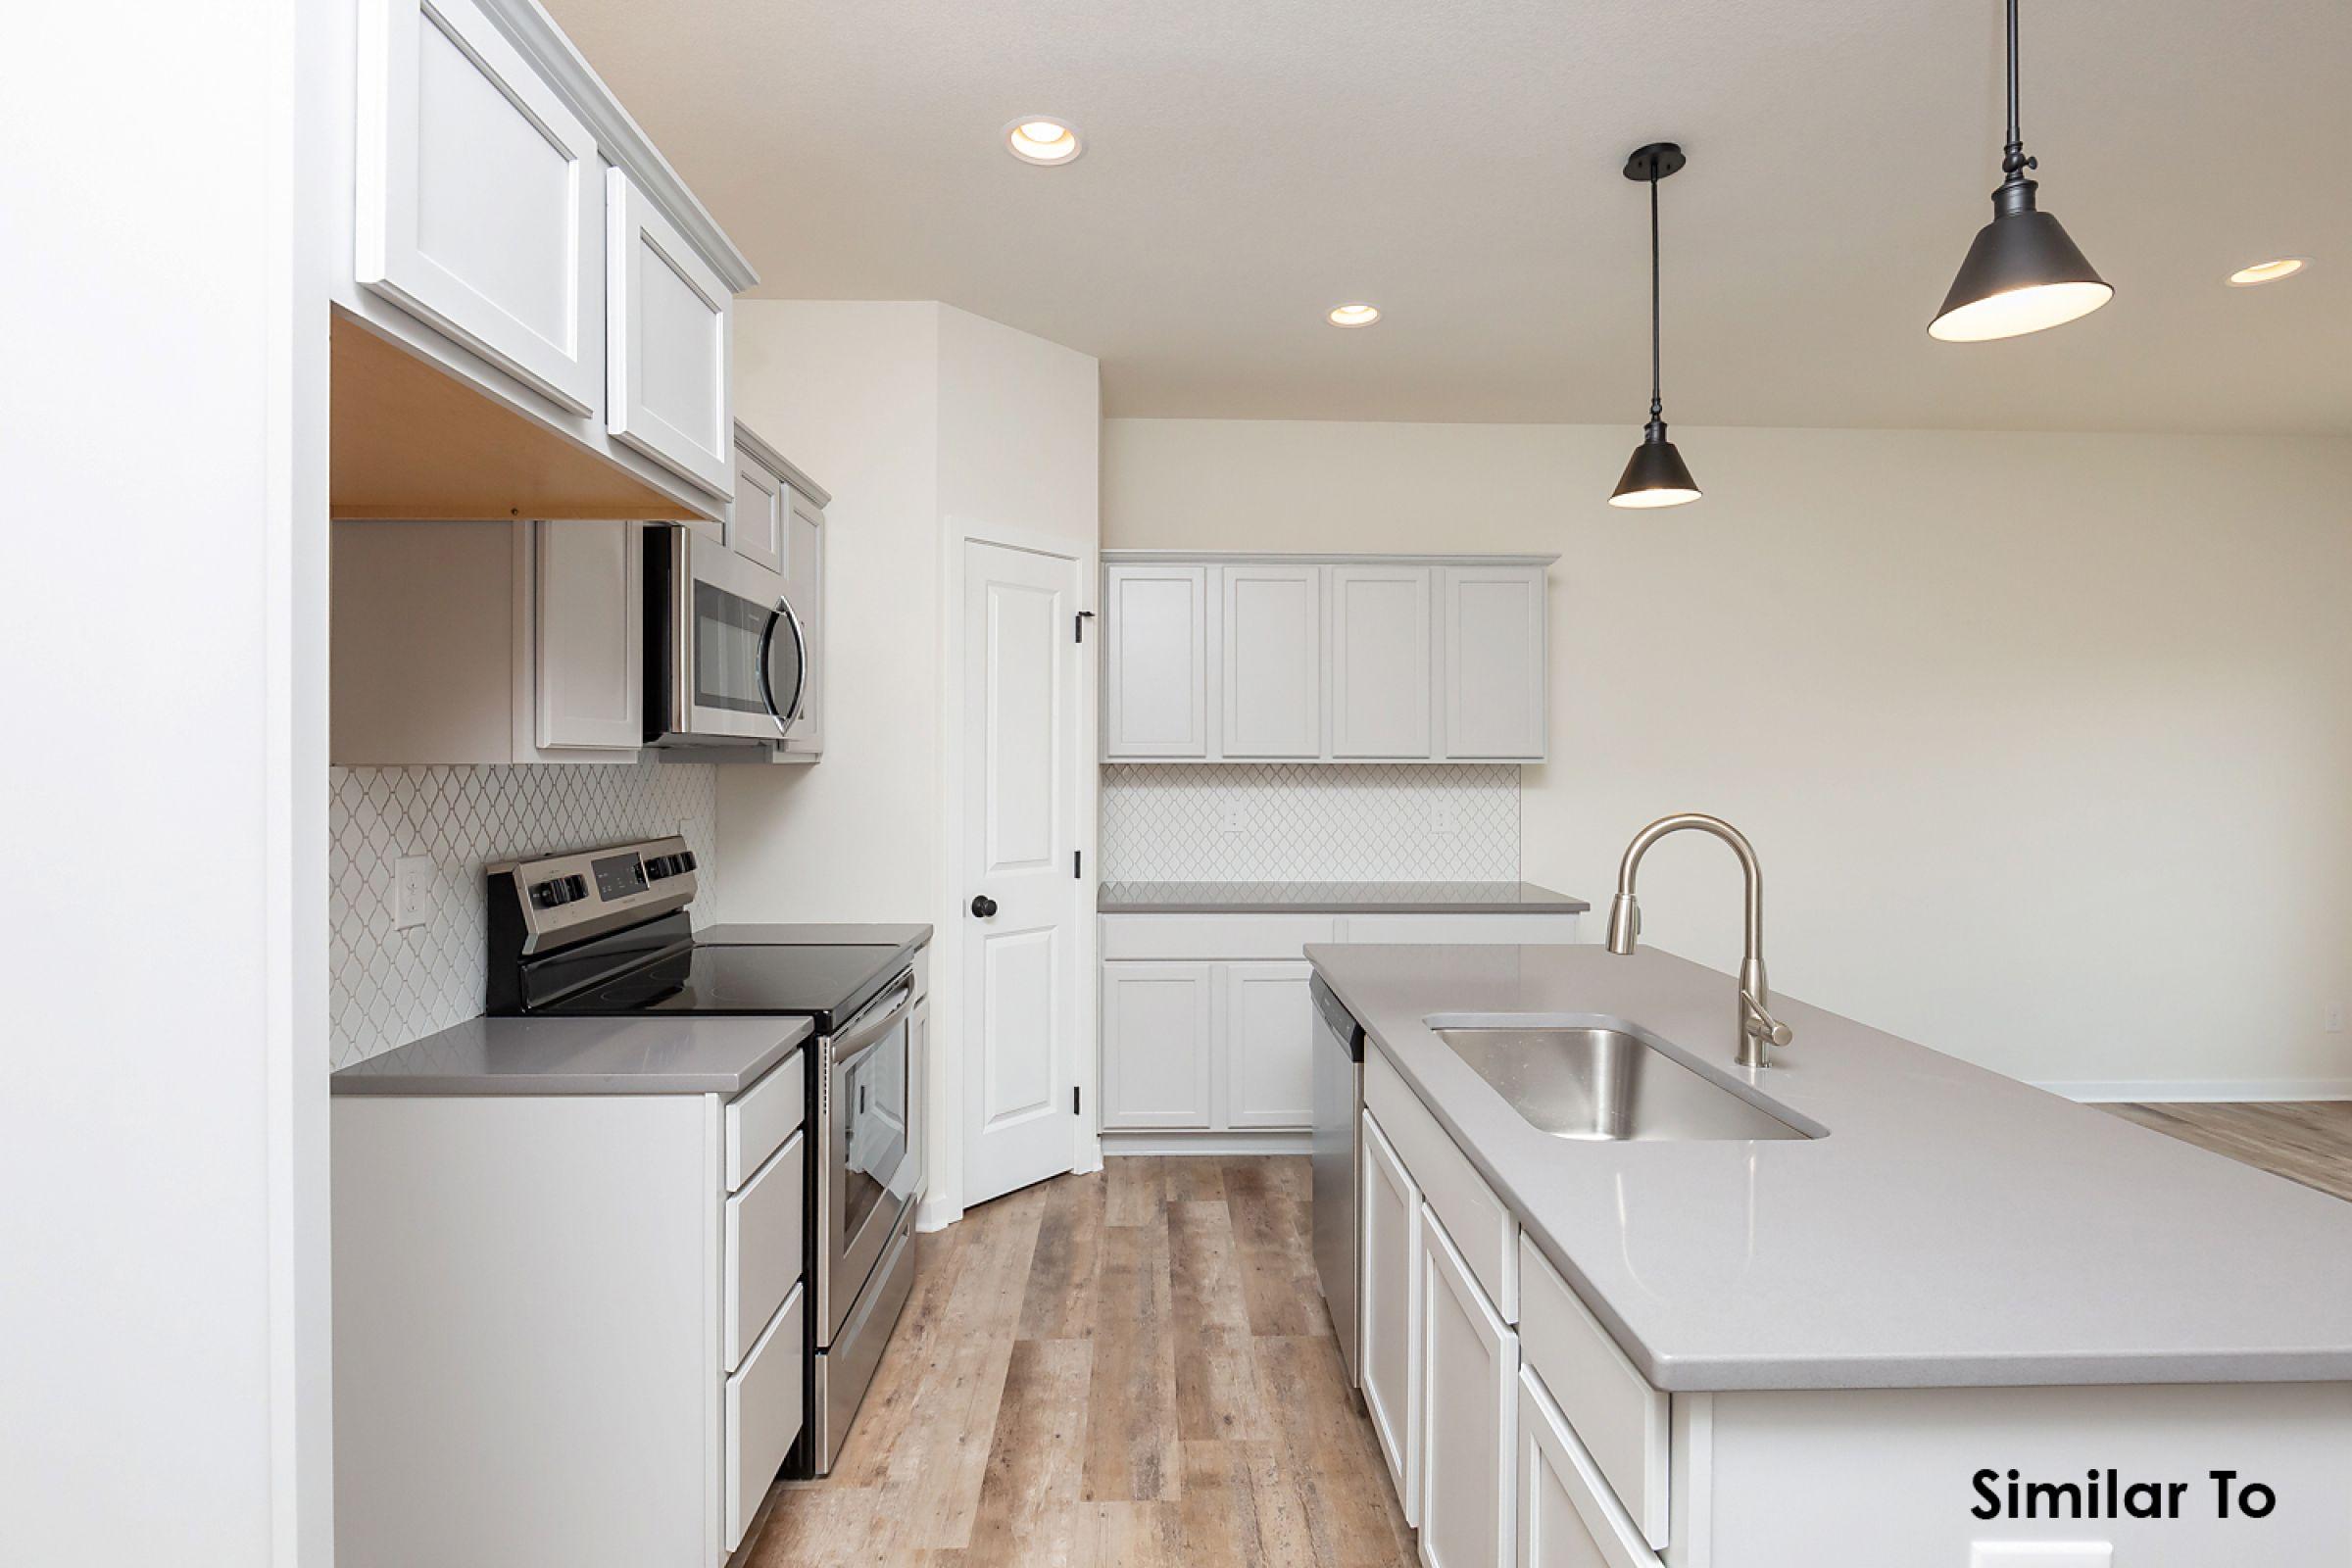 residential-warren-county-iowa-0-acres-listing-number-15134-7-2020-08-27-185026.jpg